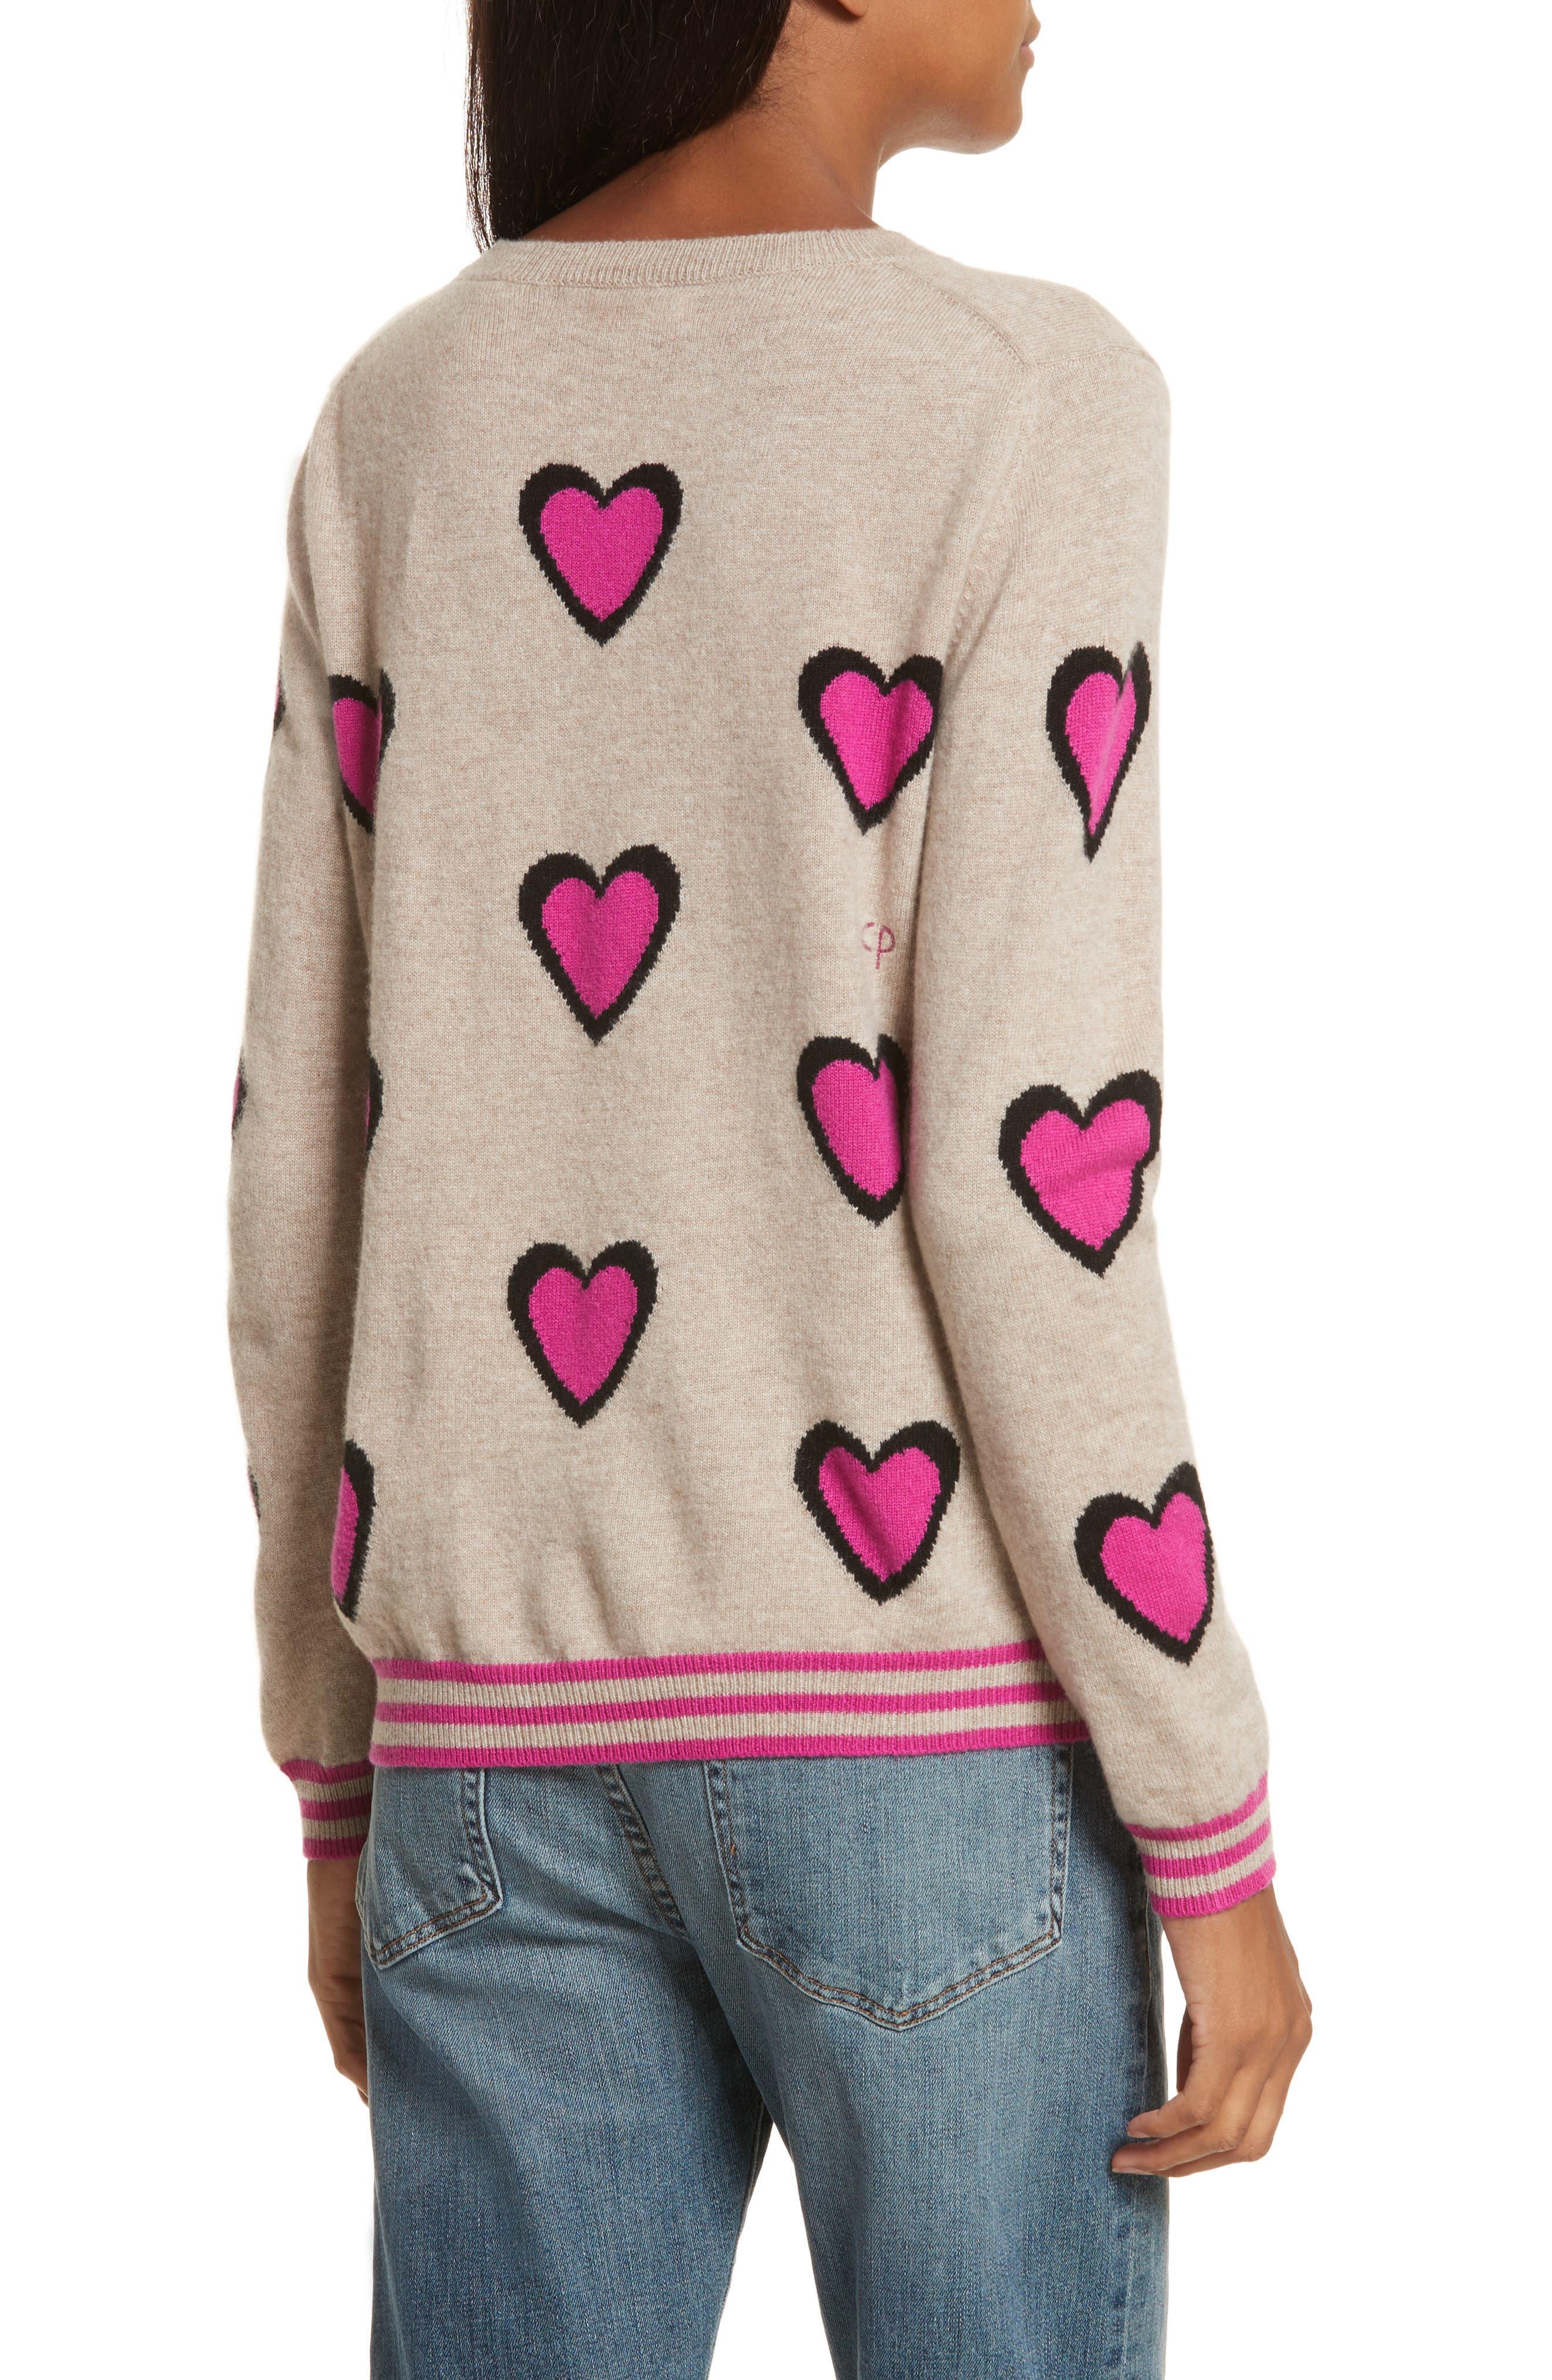 CHINTI & PARKER Heart Burst Cashmere Sweater,                             Alternate thumbnail 2, color,                             Oatmeal/ Black/ Fuchsia